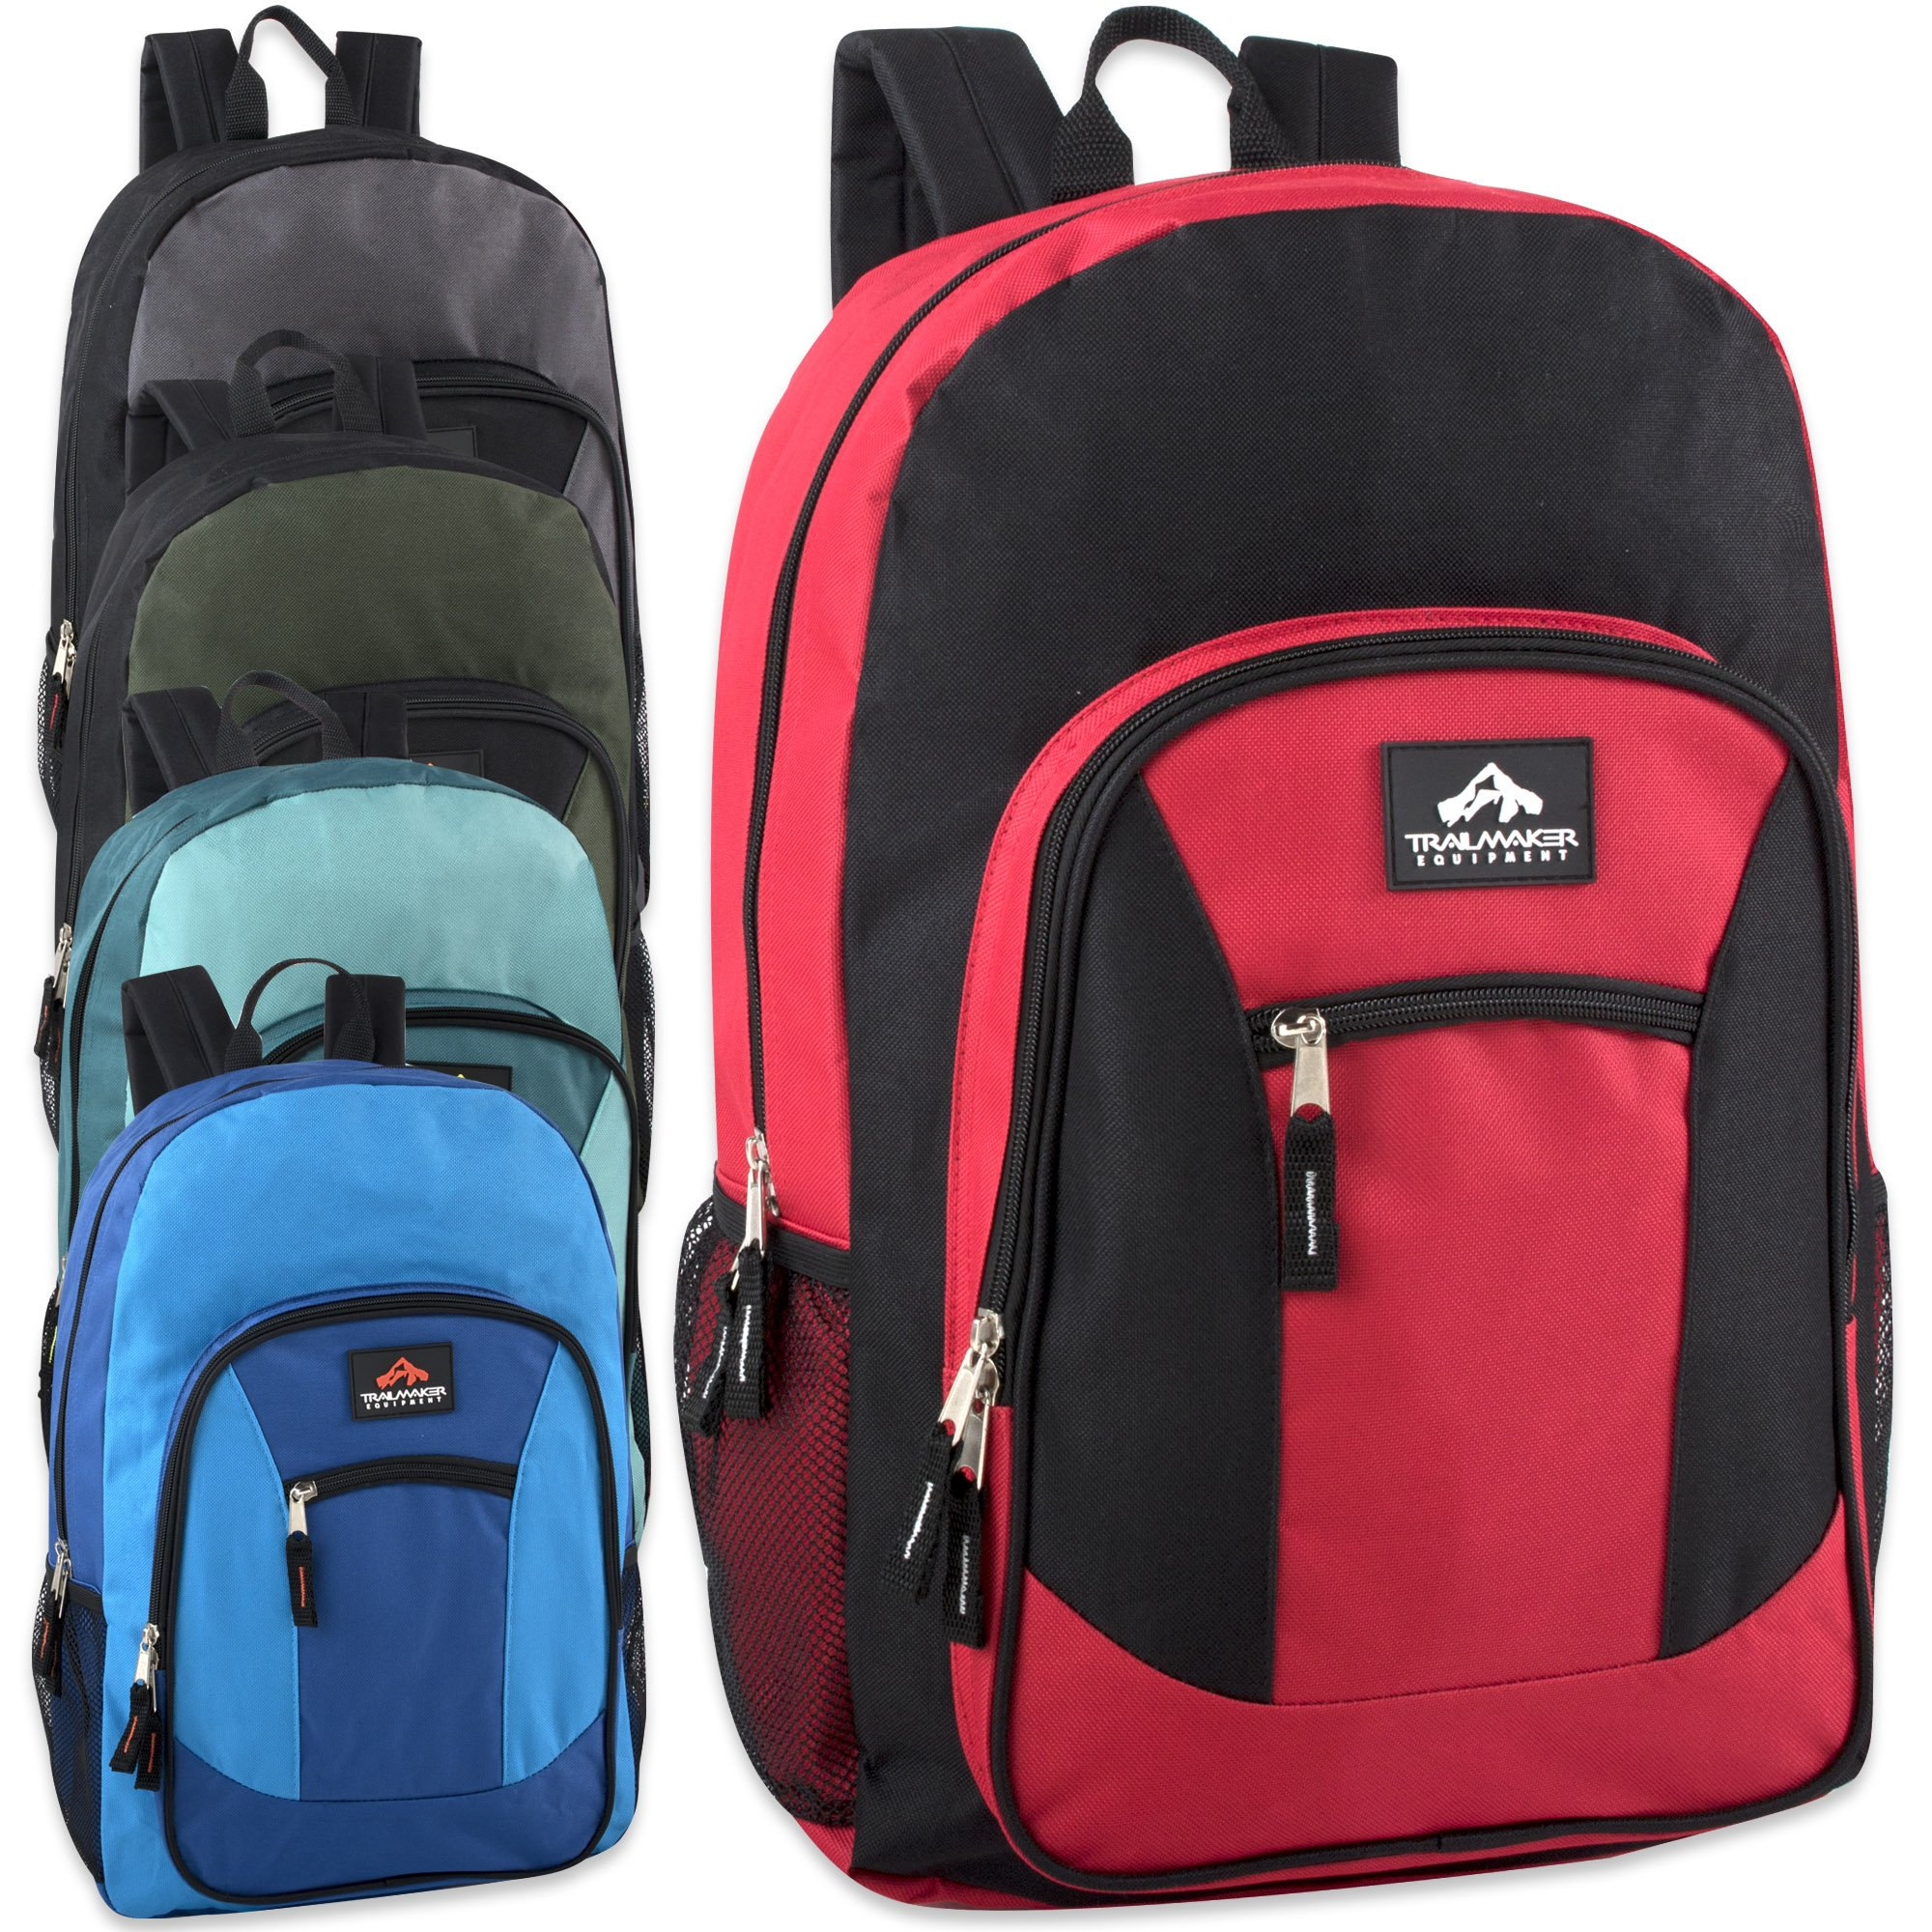 Wholesale Trailmaker 19 Inch Multi Pocket Backpack in Bulk 24 Packs (Boys Assorted) by Trail maker